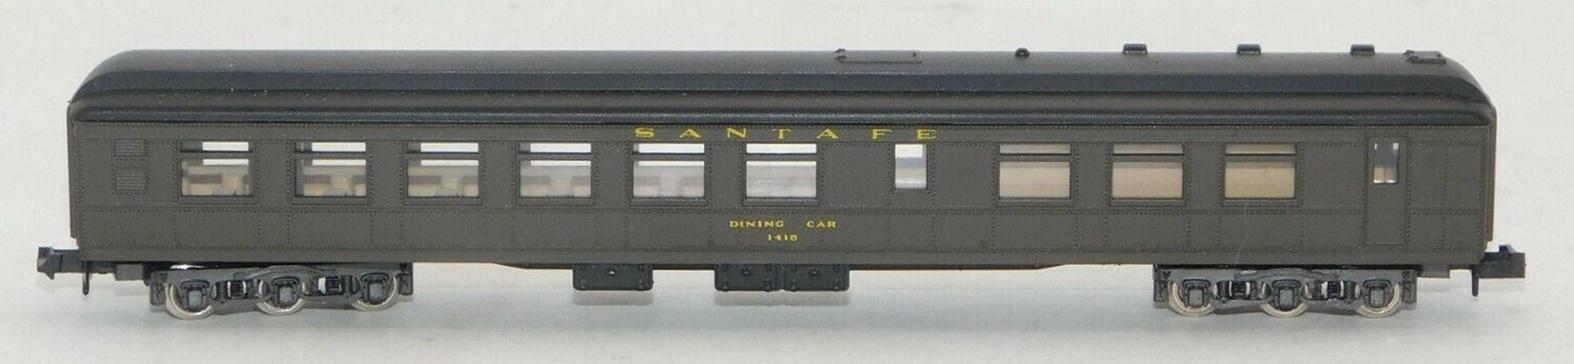 N Scale - Rivarossi - 9538 - Passenger Car, Heavyweight, Diner - Santa Fe - 1418